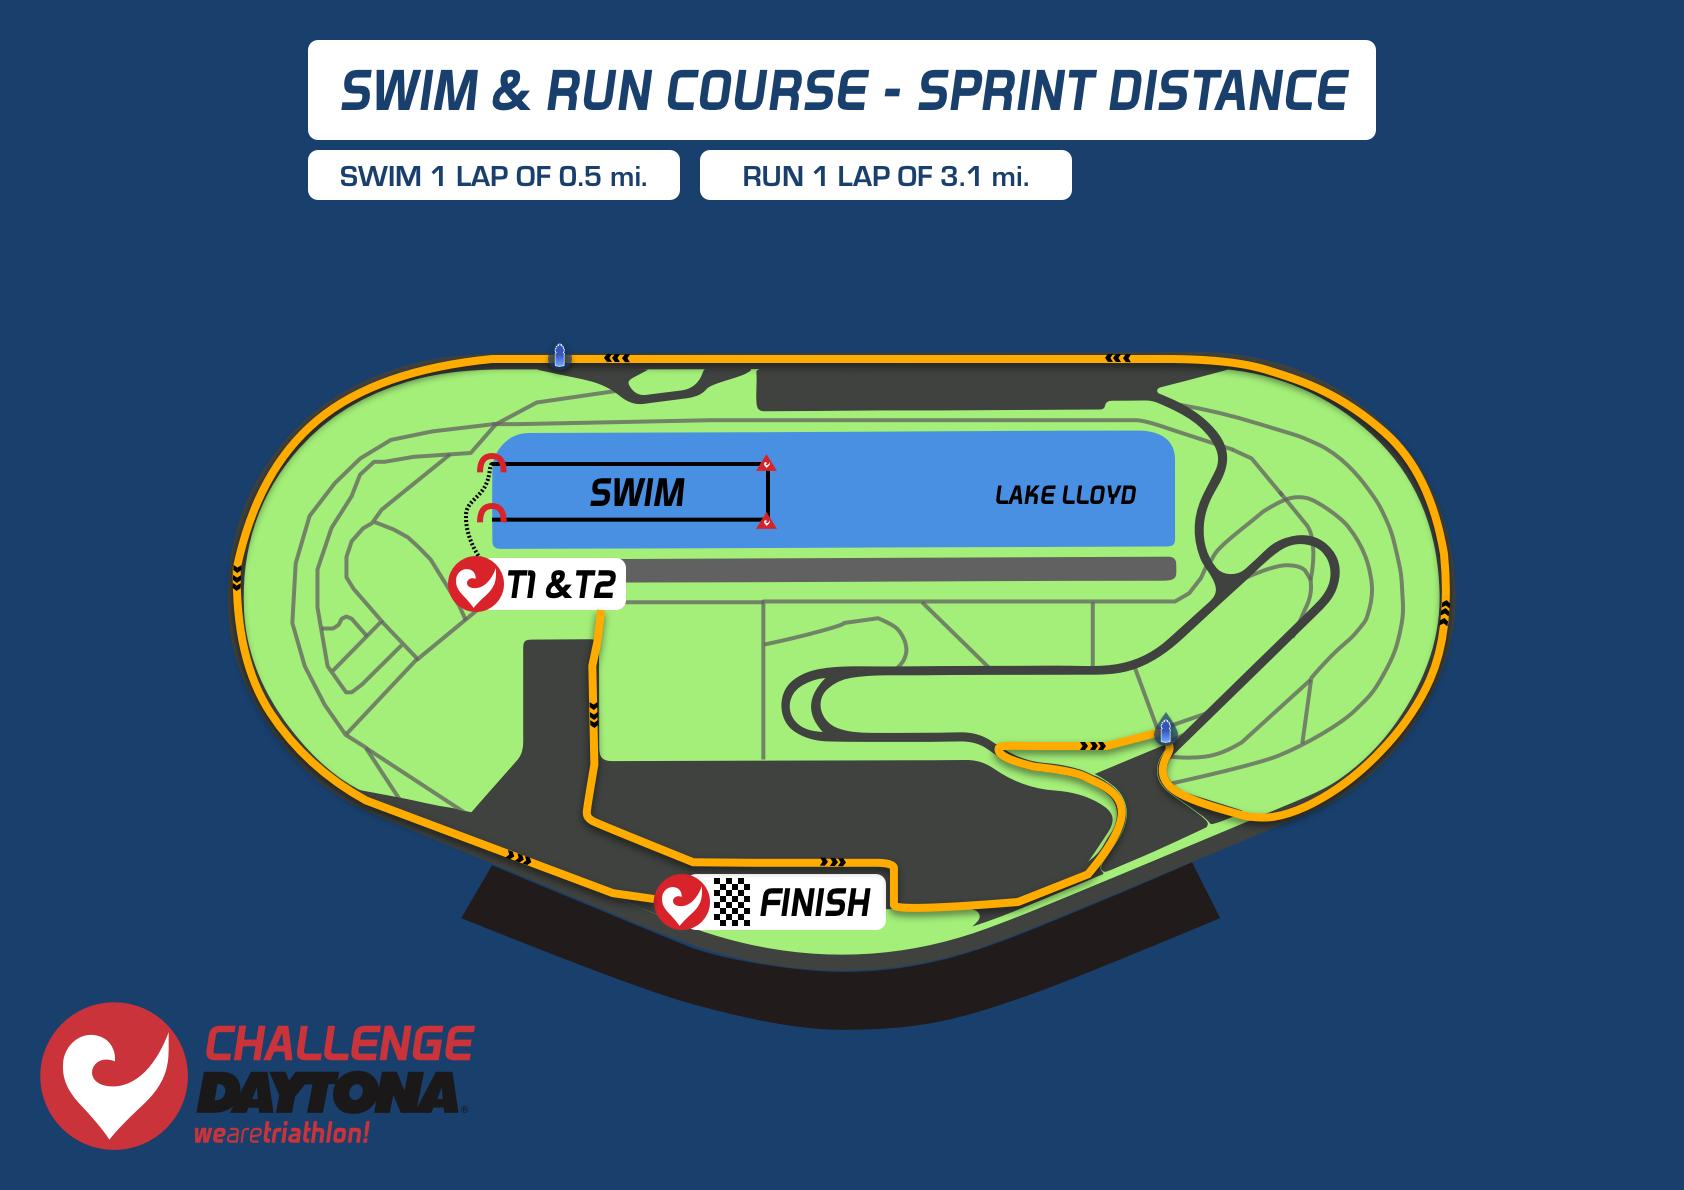 Swim course information